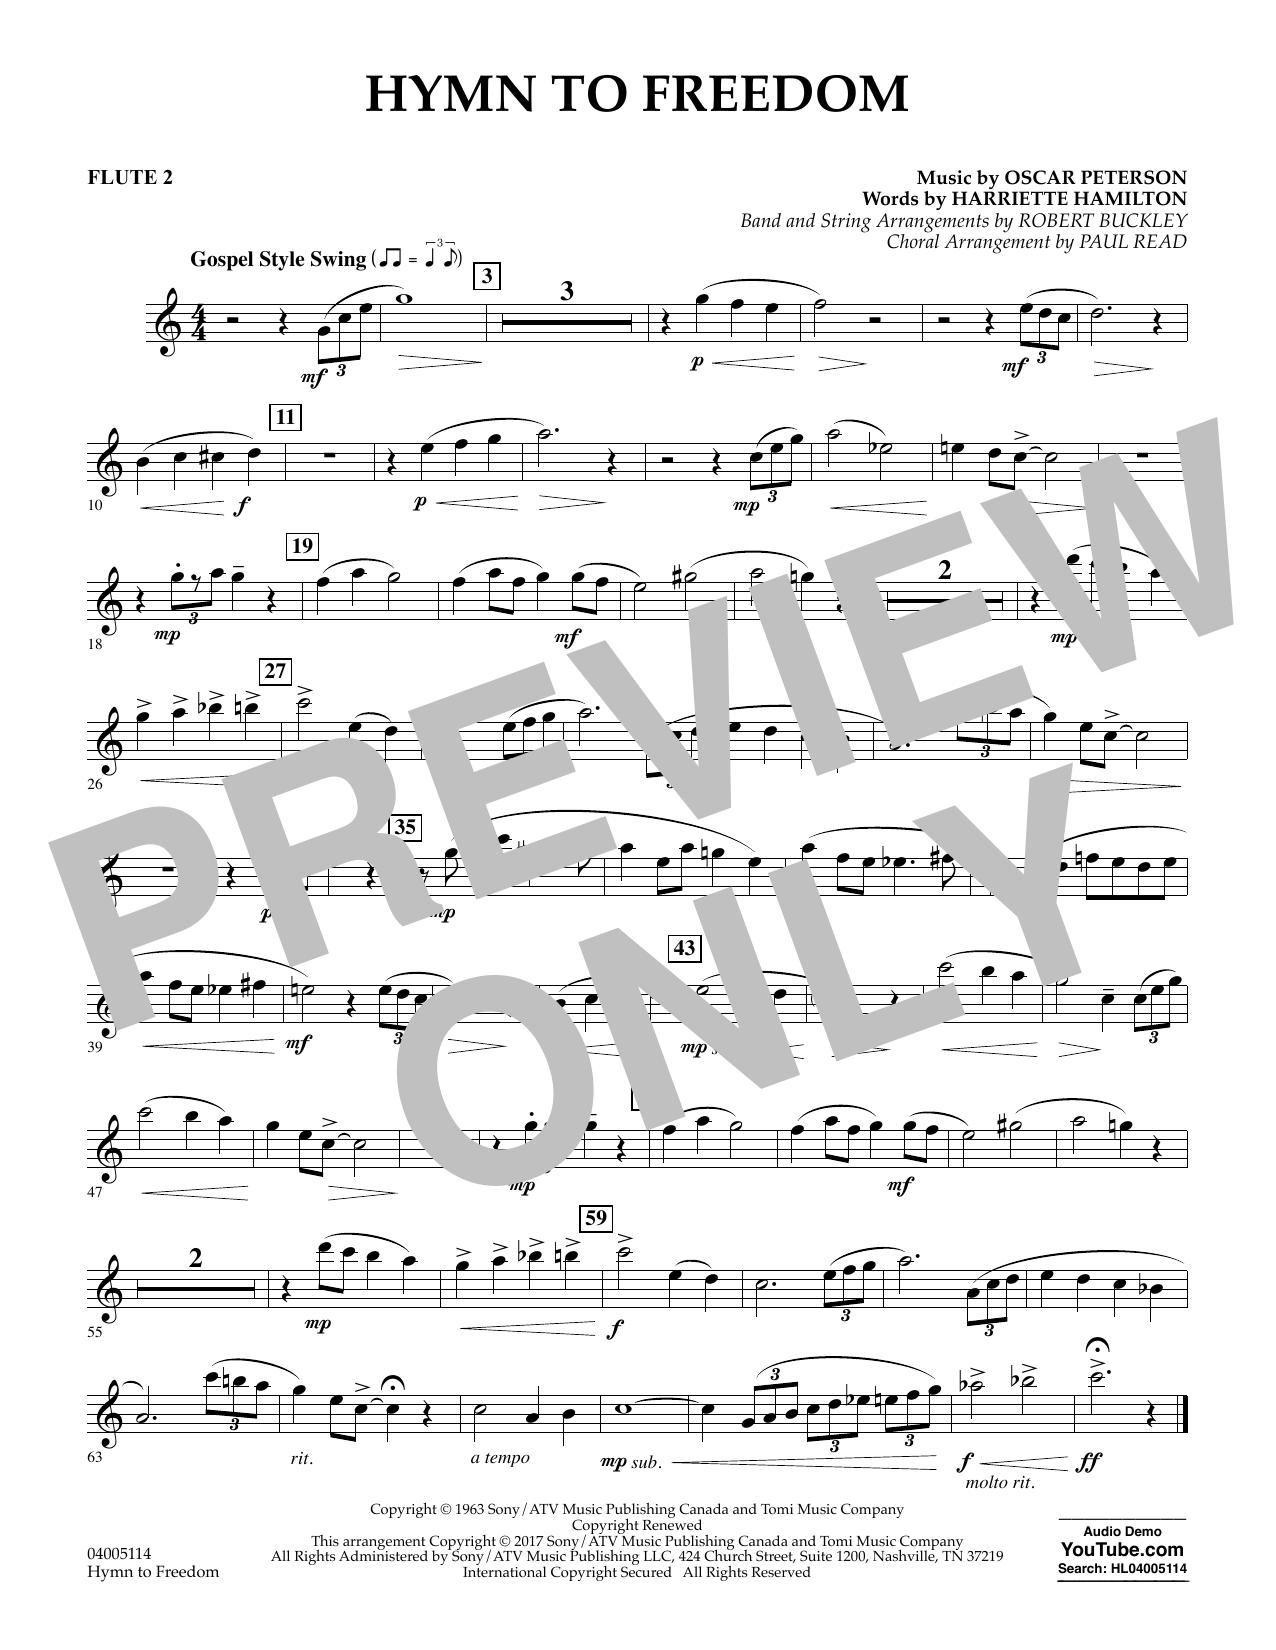 Hymn to Freedom - Flute 2 (Flex-Band)